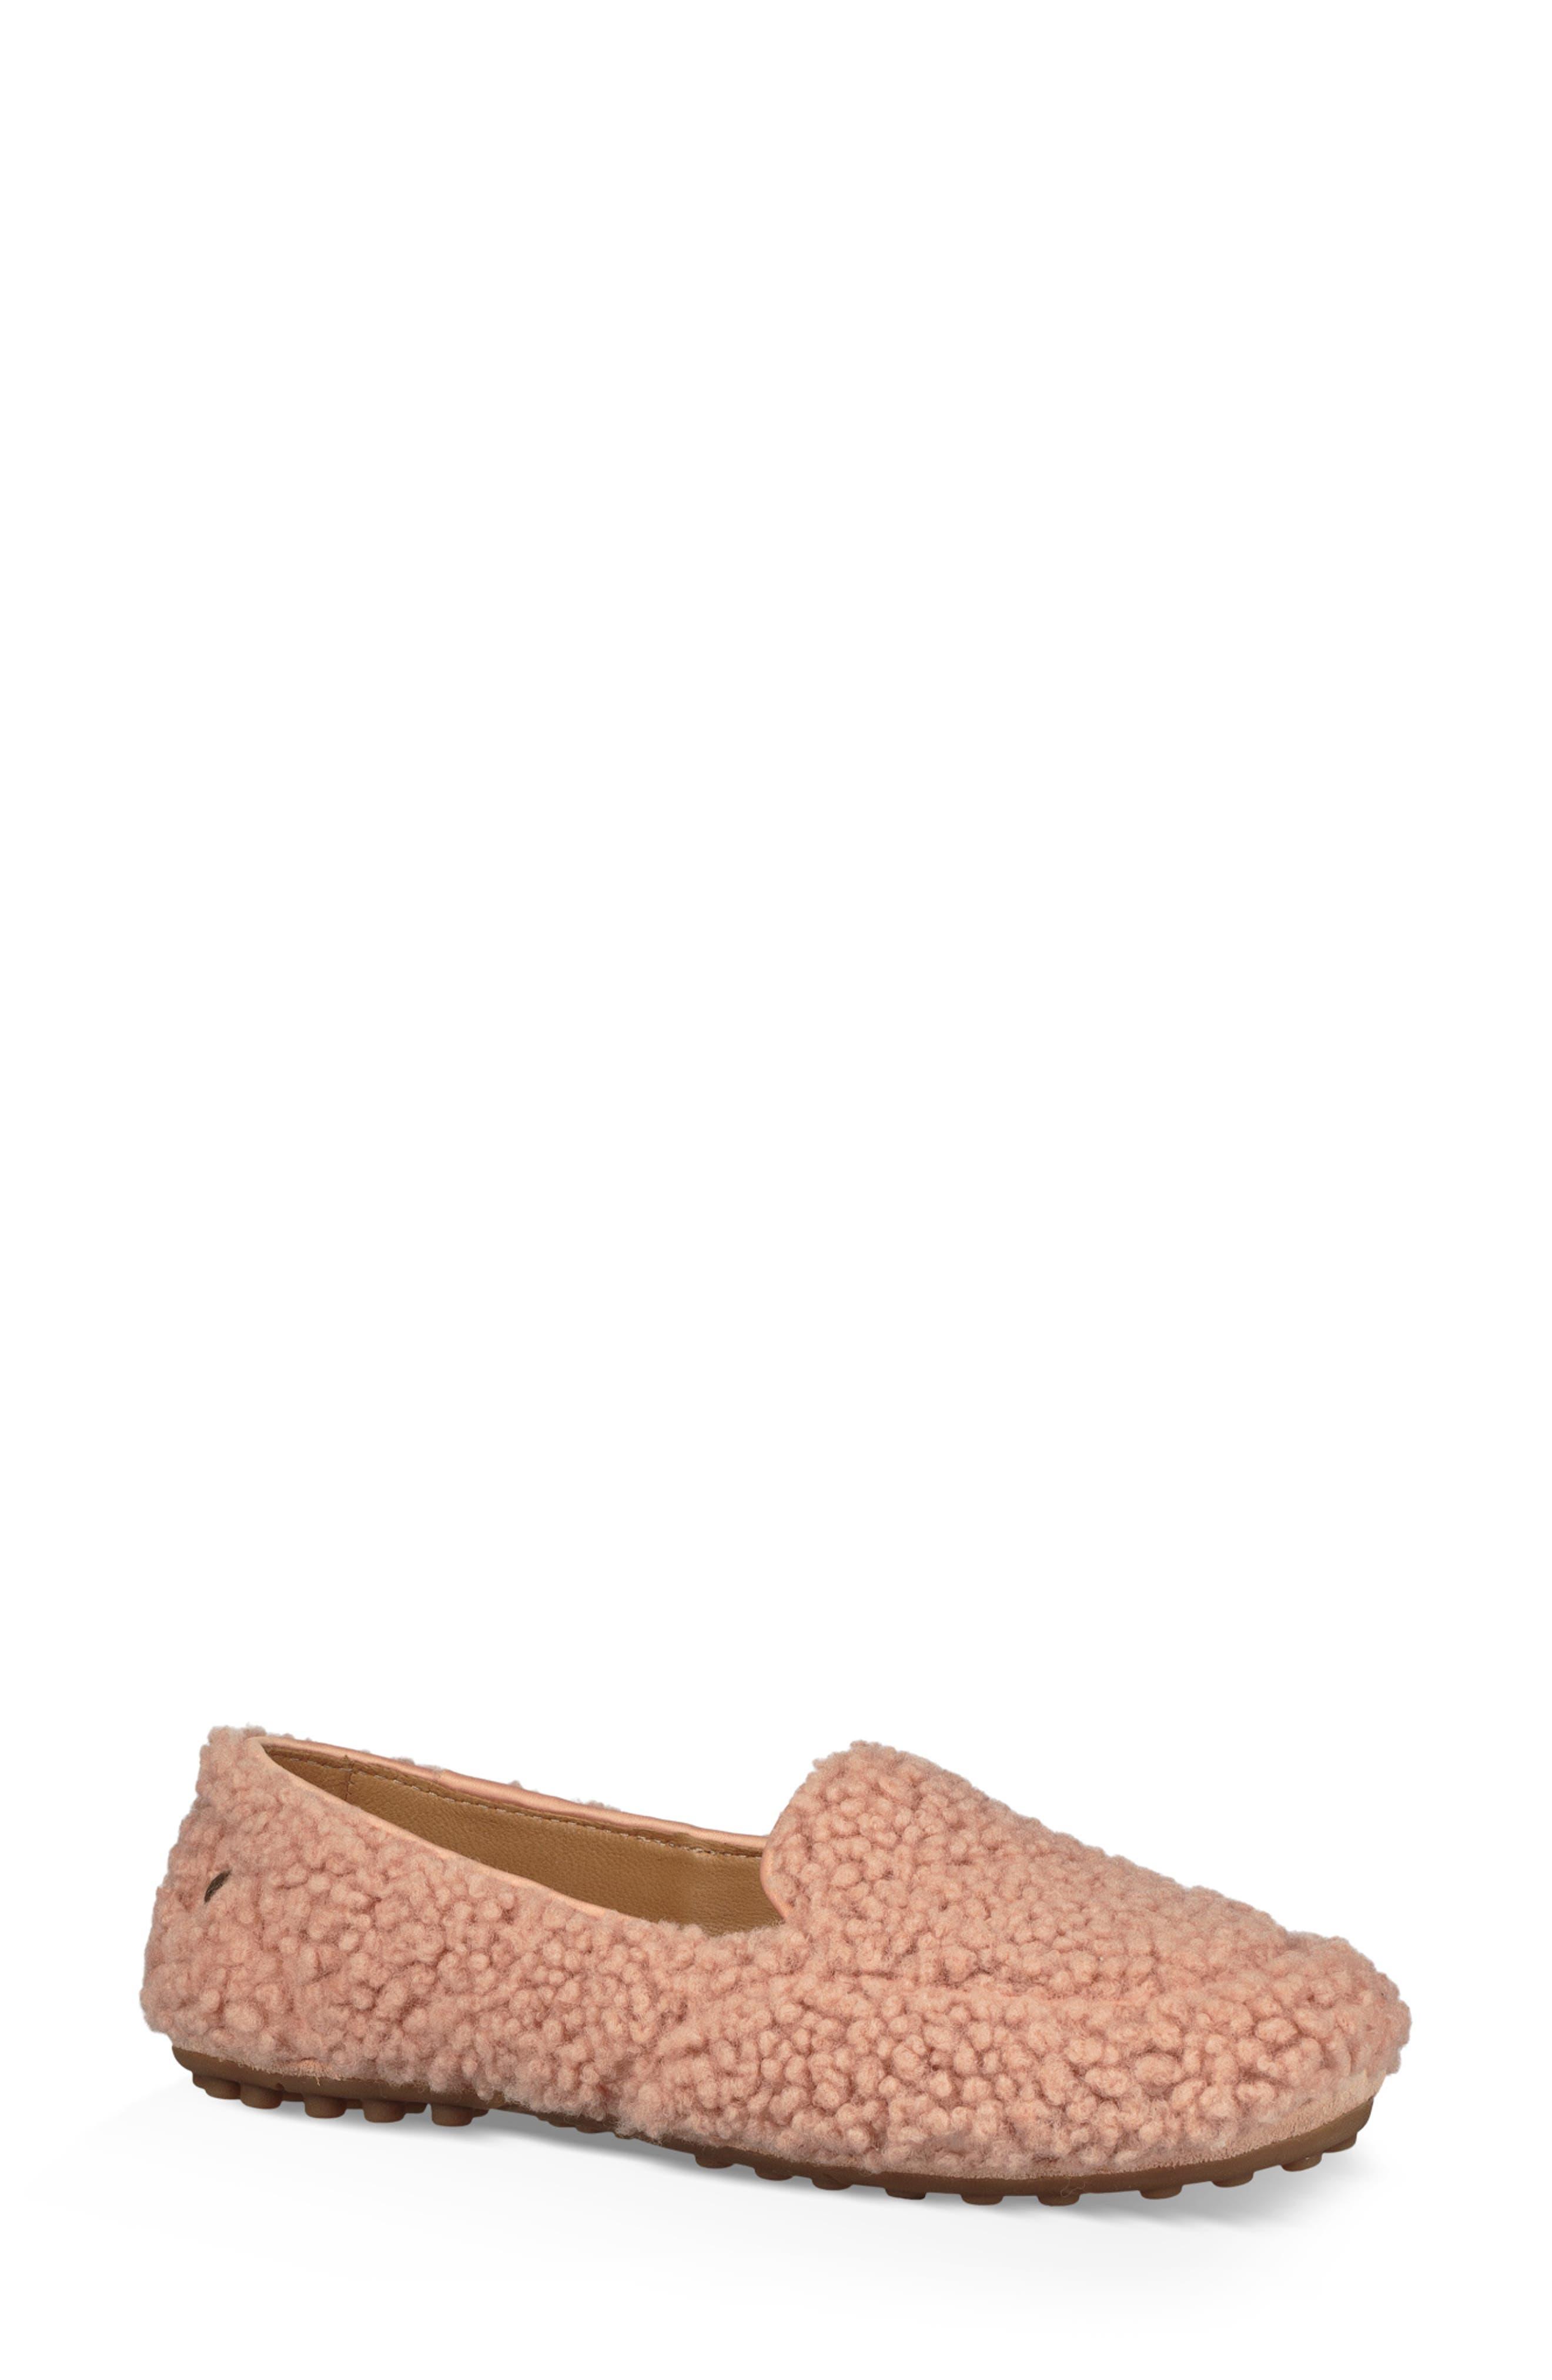 Ugg Hailey Fluff Genuine Shearling Slipper, Pink